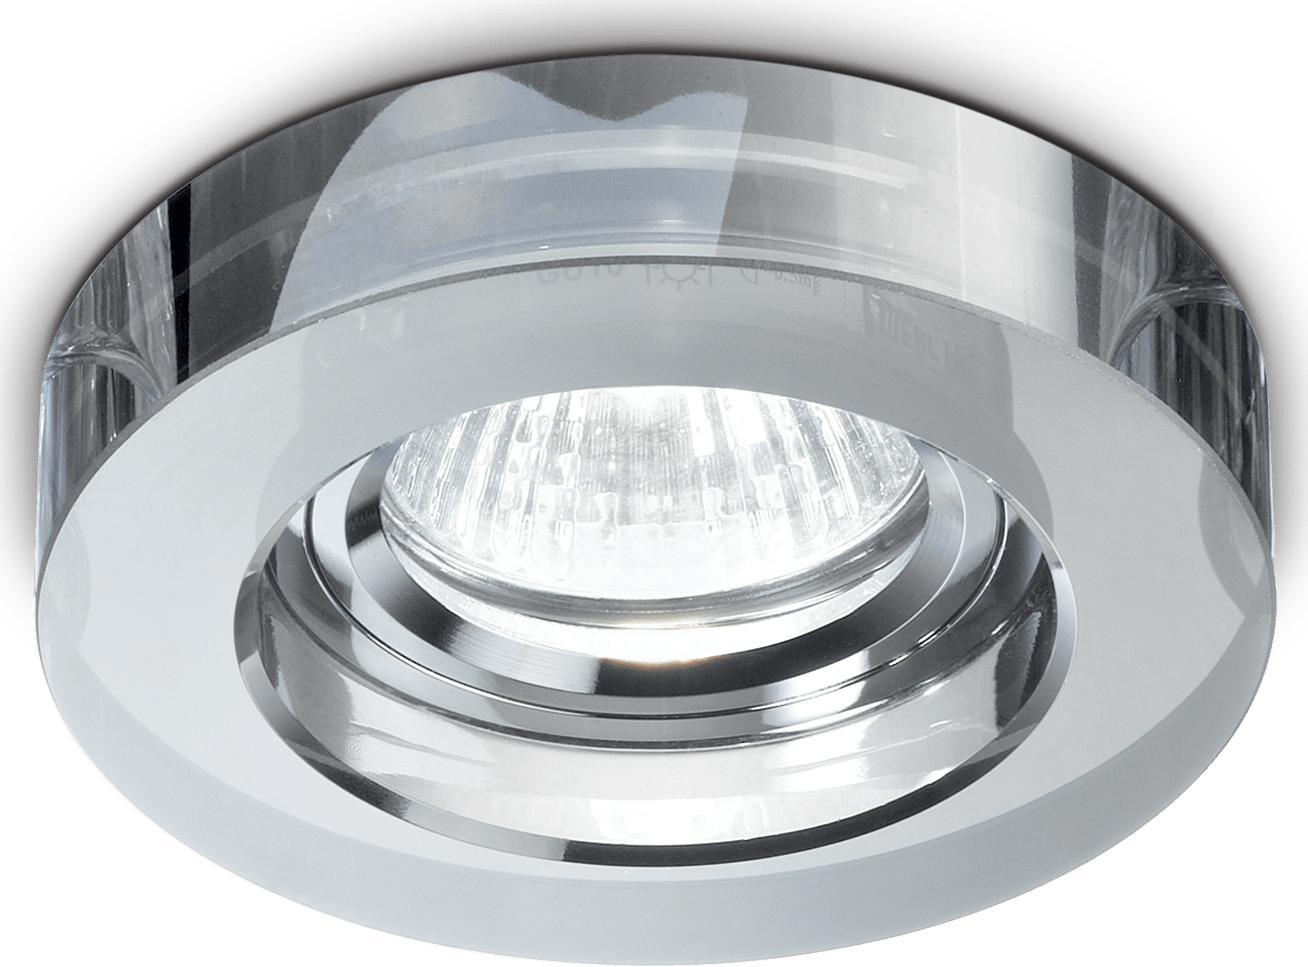 Ideal lux LED Blues fume eingebaute Lampe 5W 113982